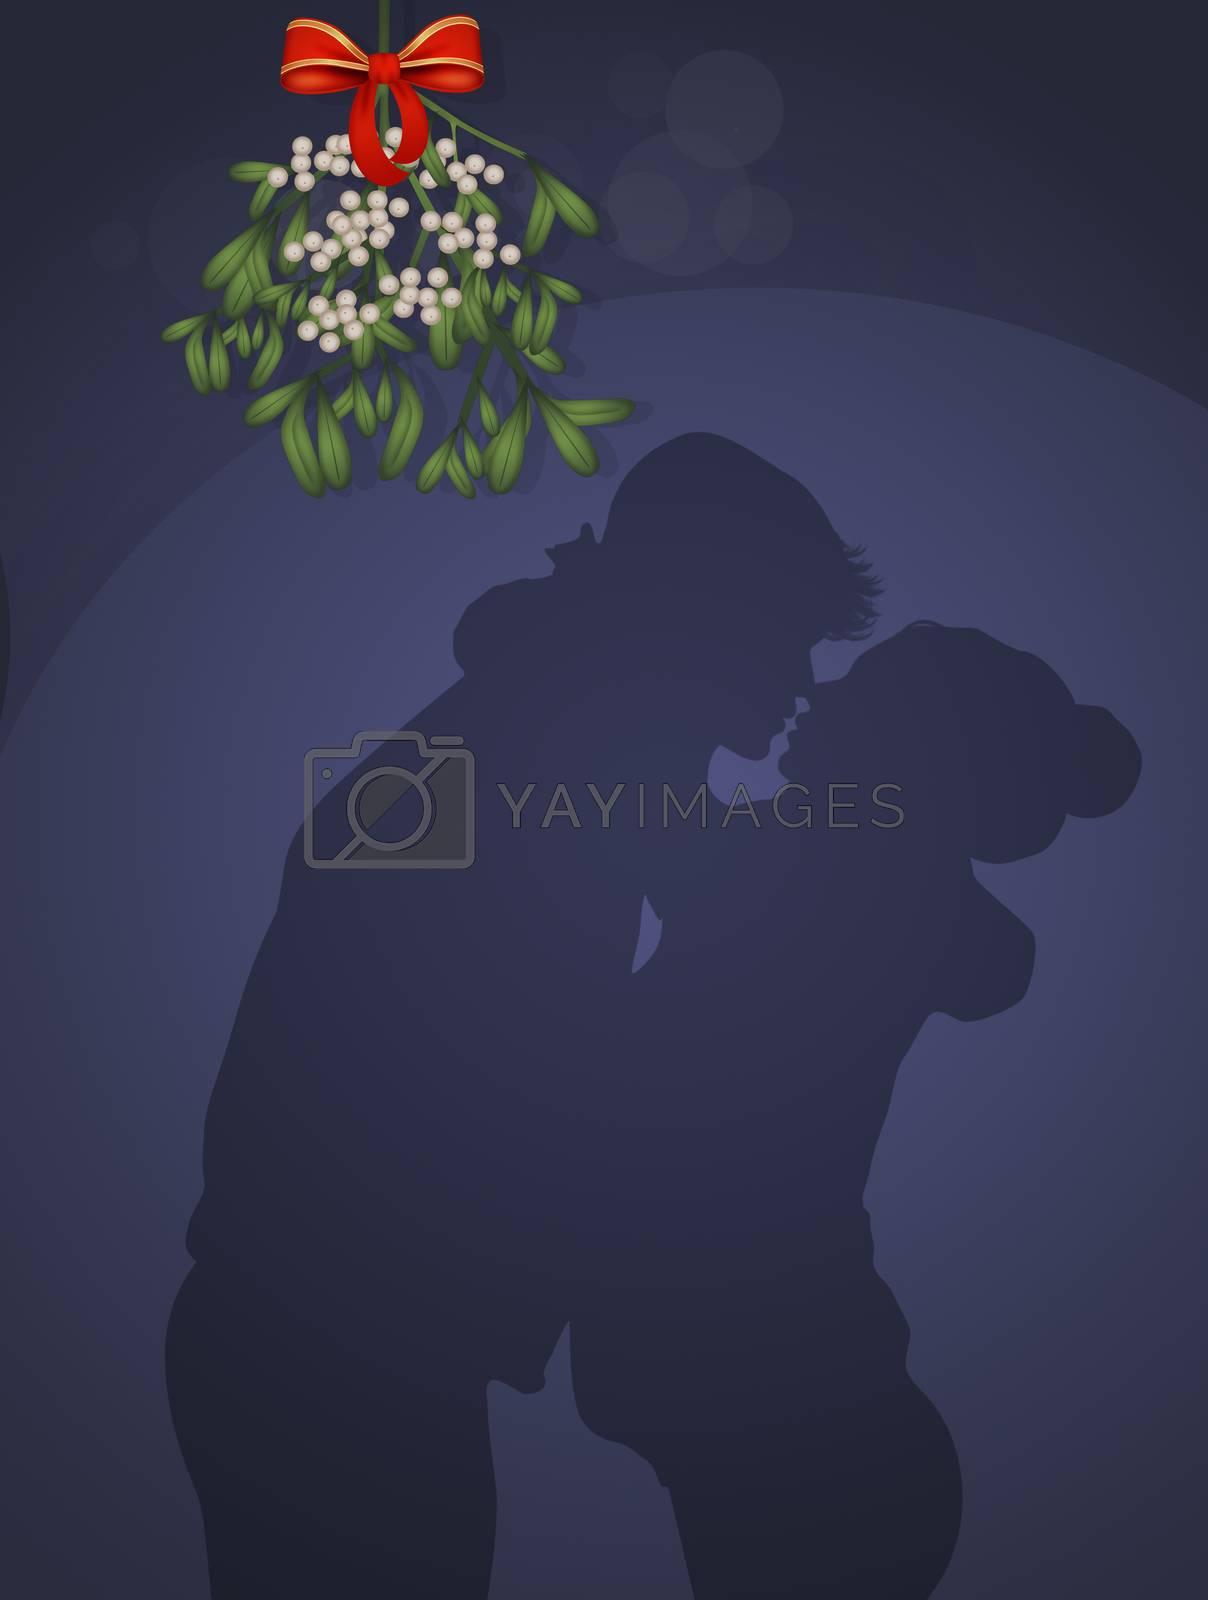 illustration of couple kissing under the mistletoe